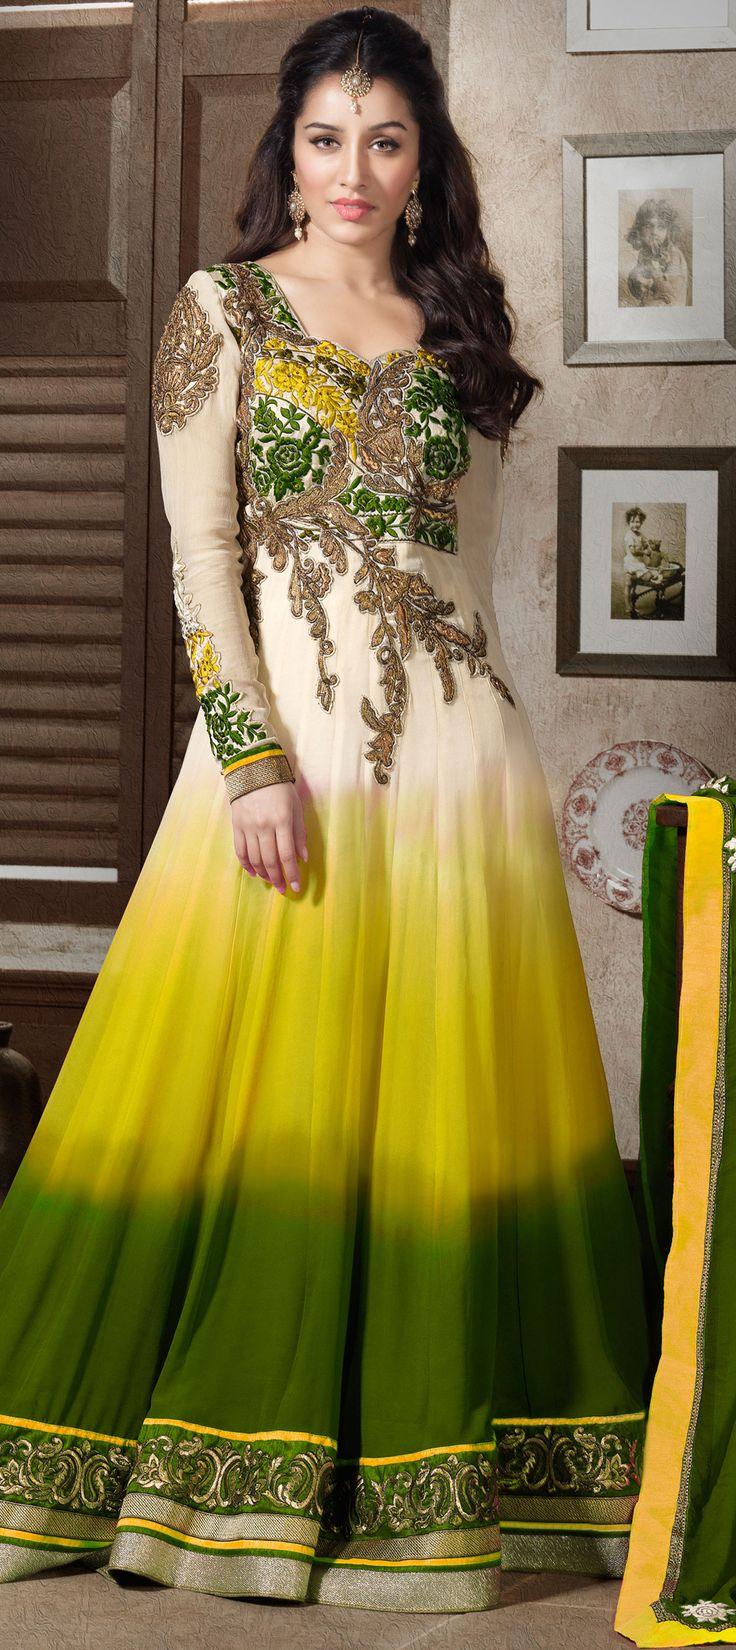 421712: Shraddha Kapoor Ombre Bollywood Anarkali